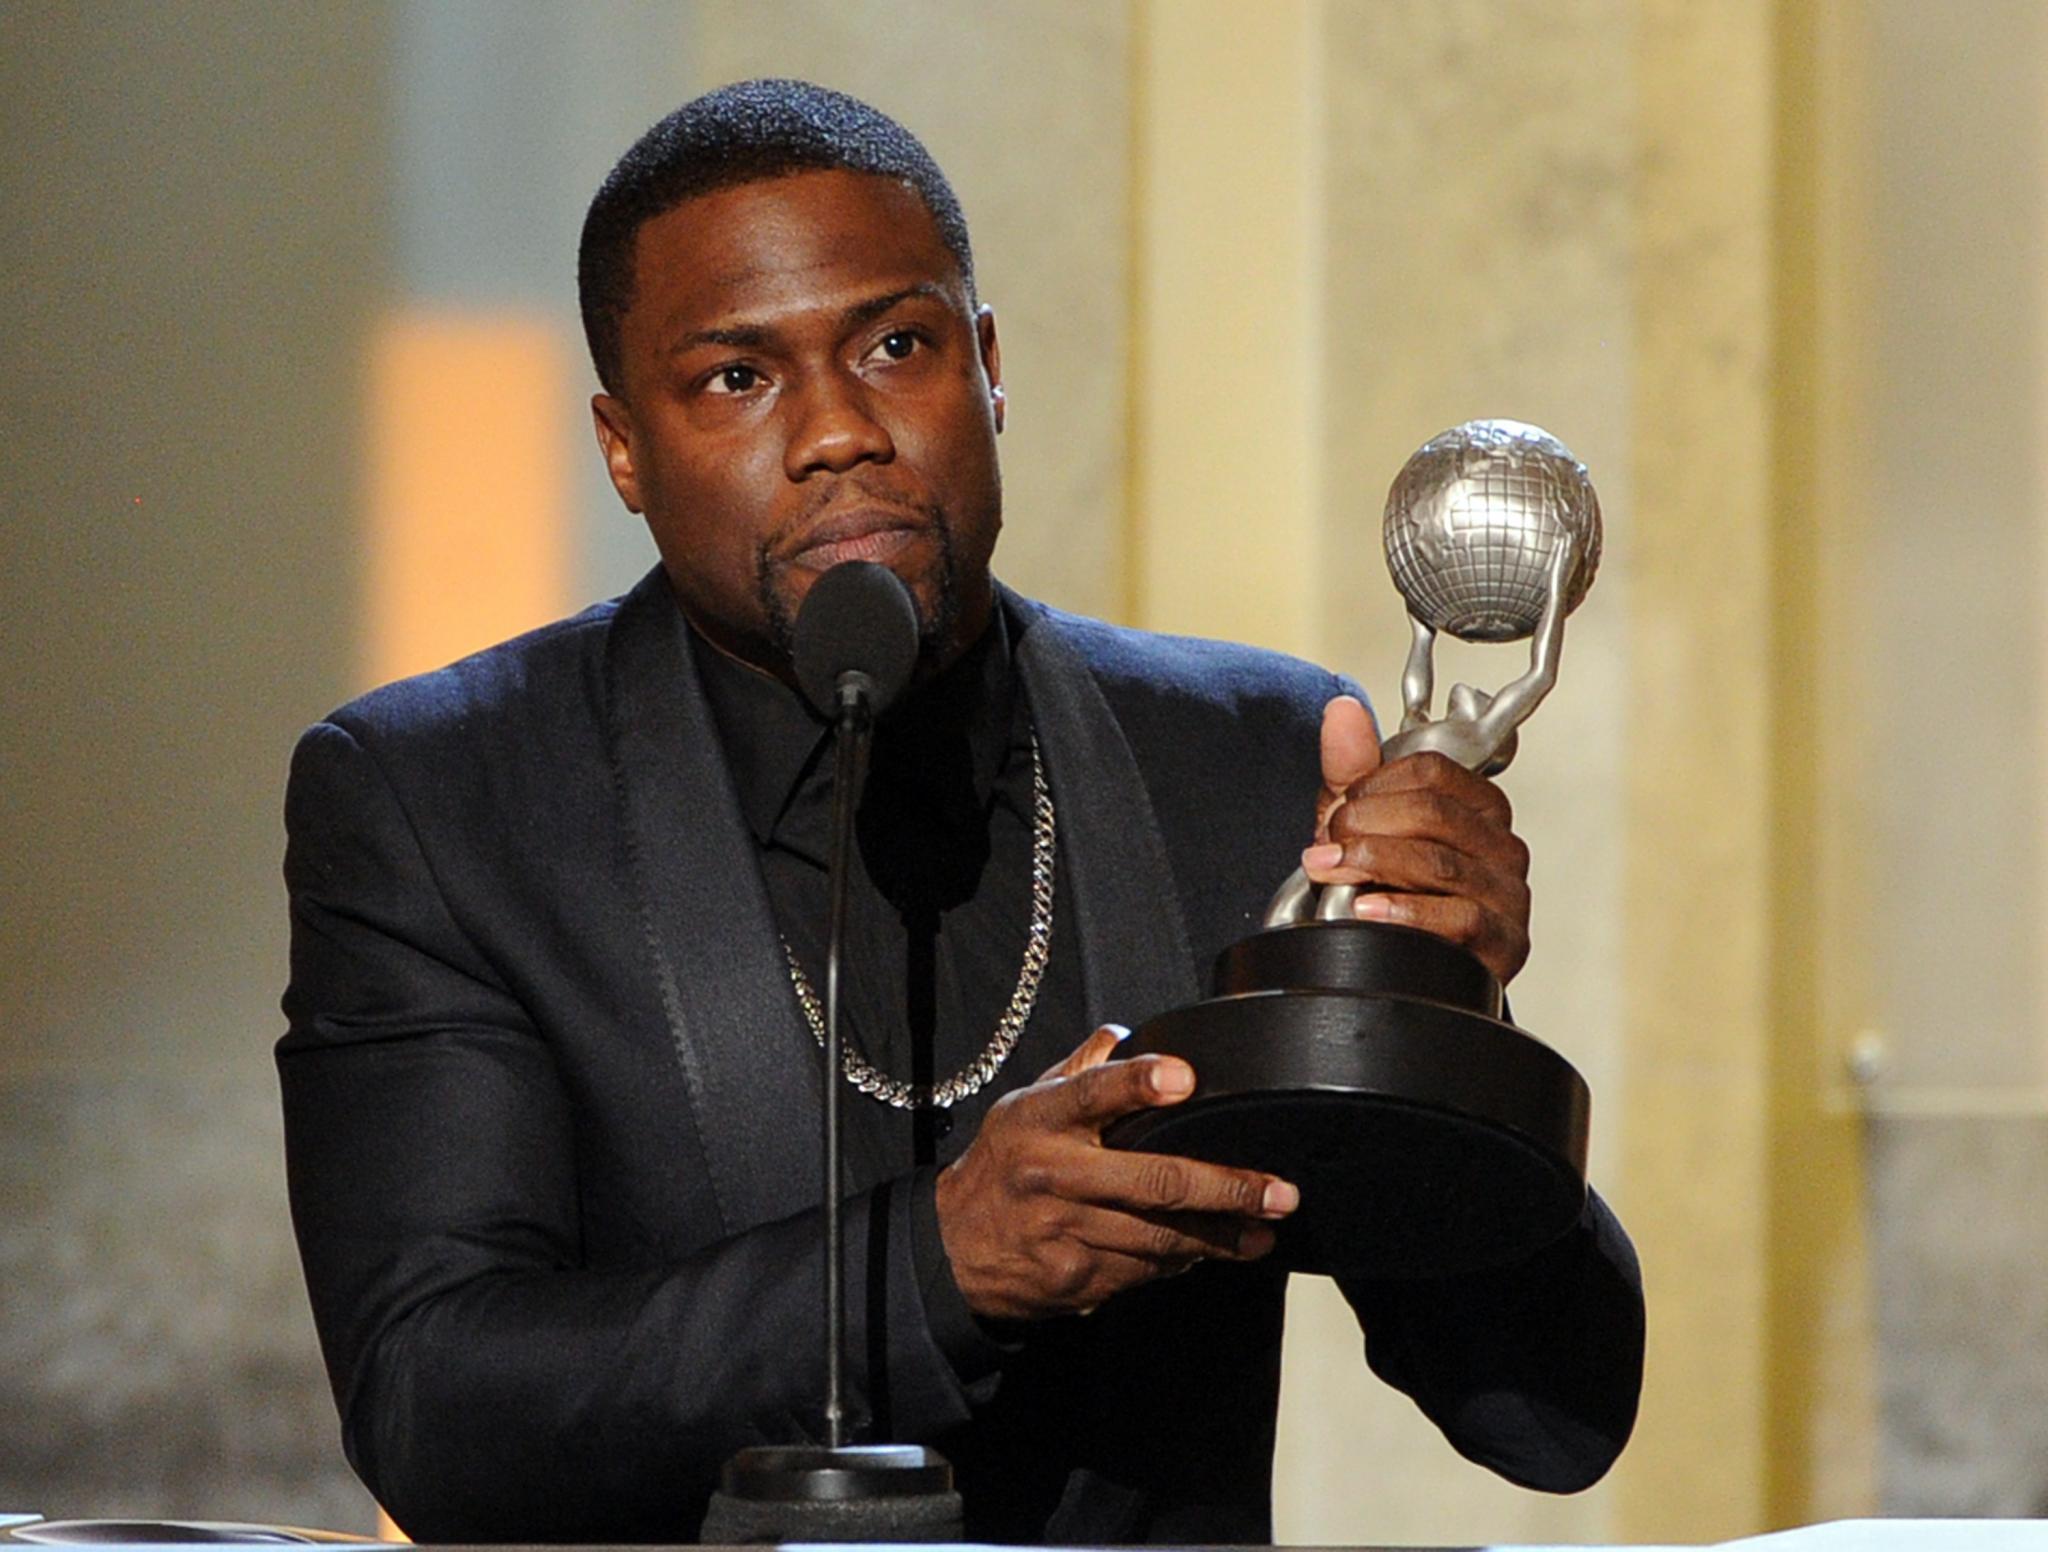 Stars Win Big at the 45th Annual NAACP Awards